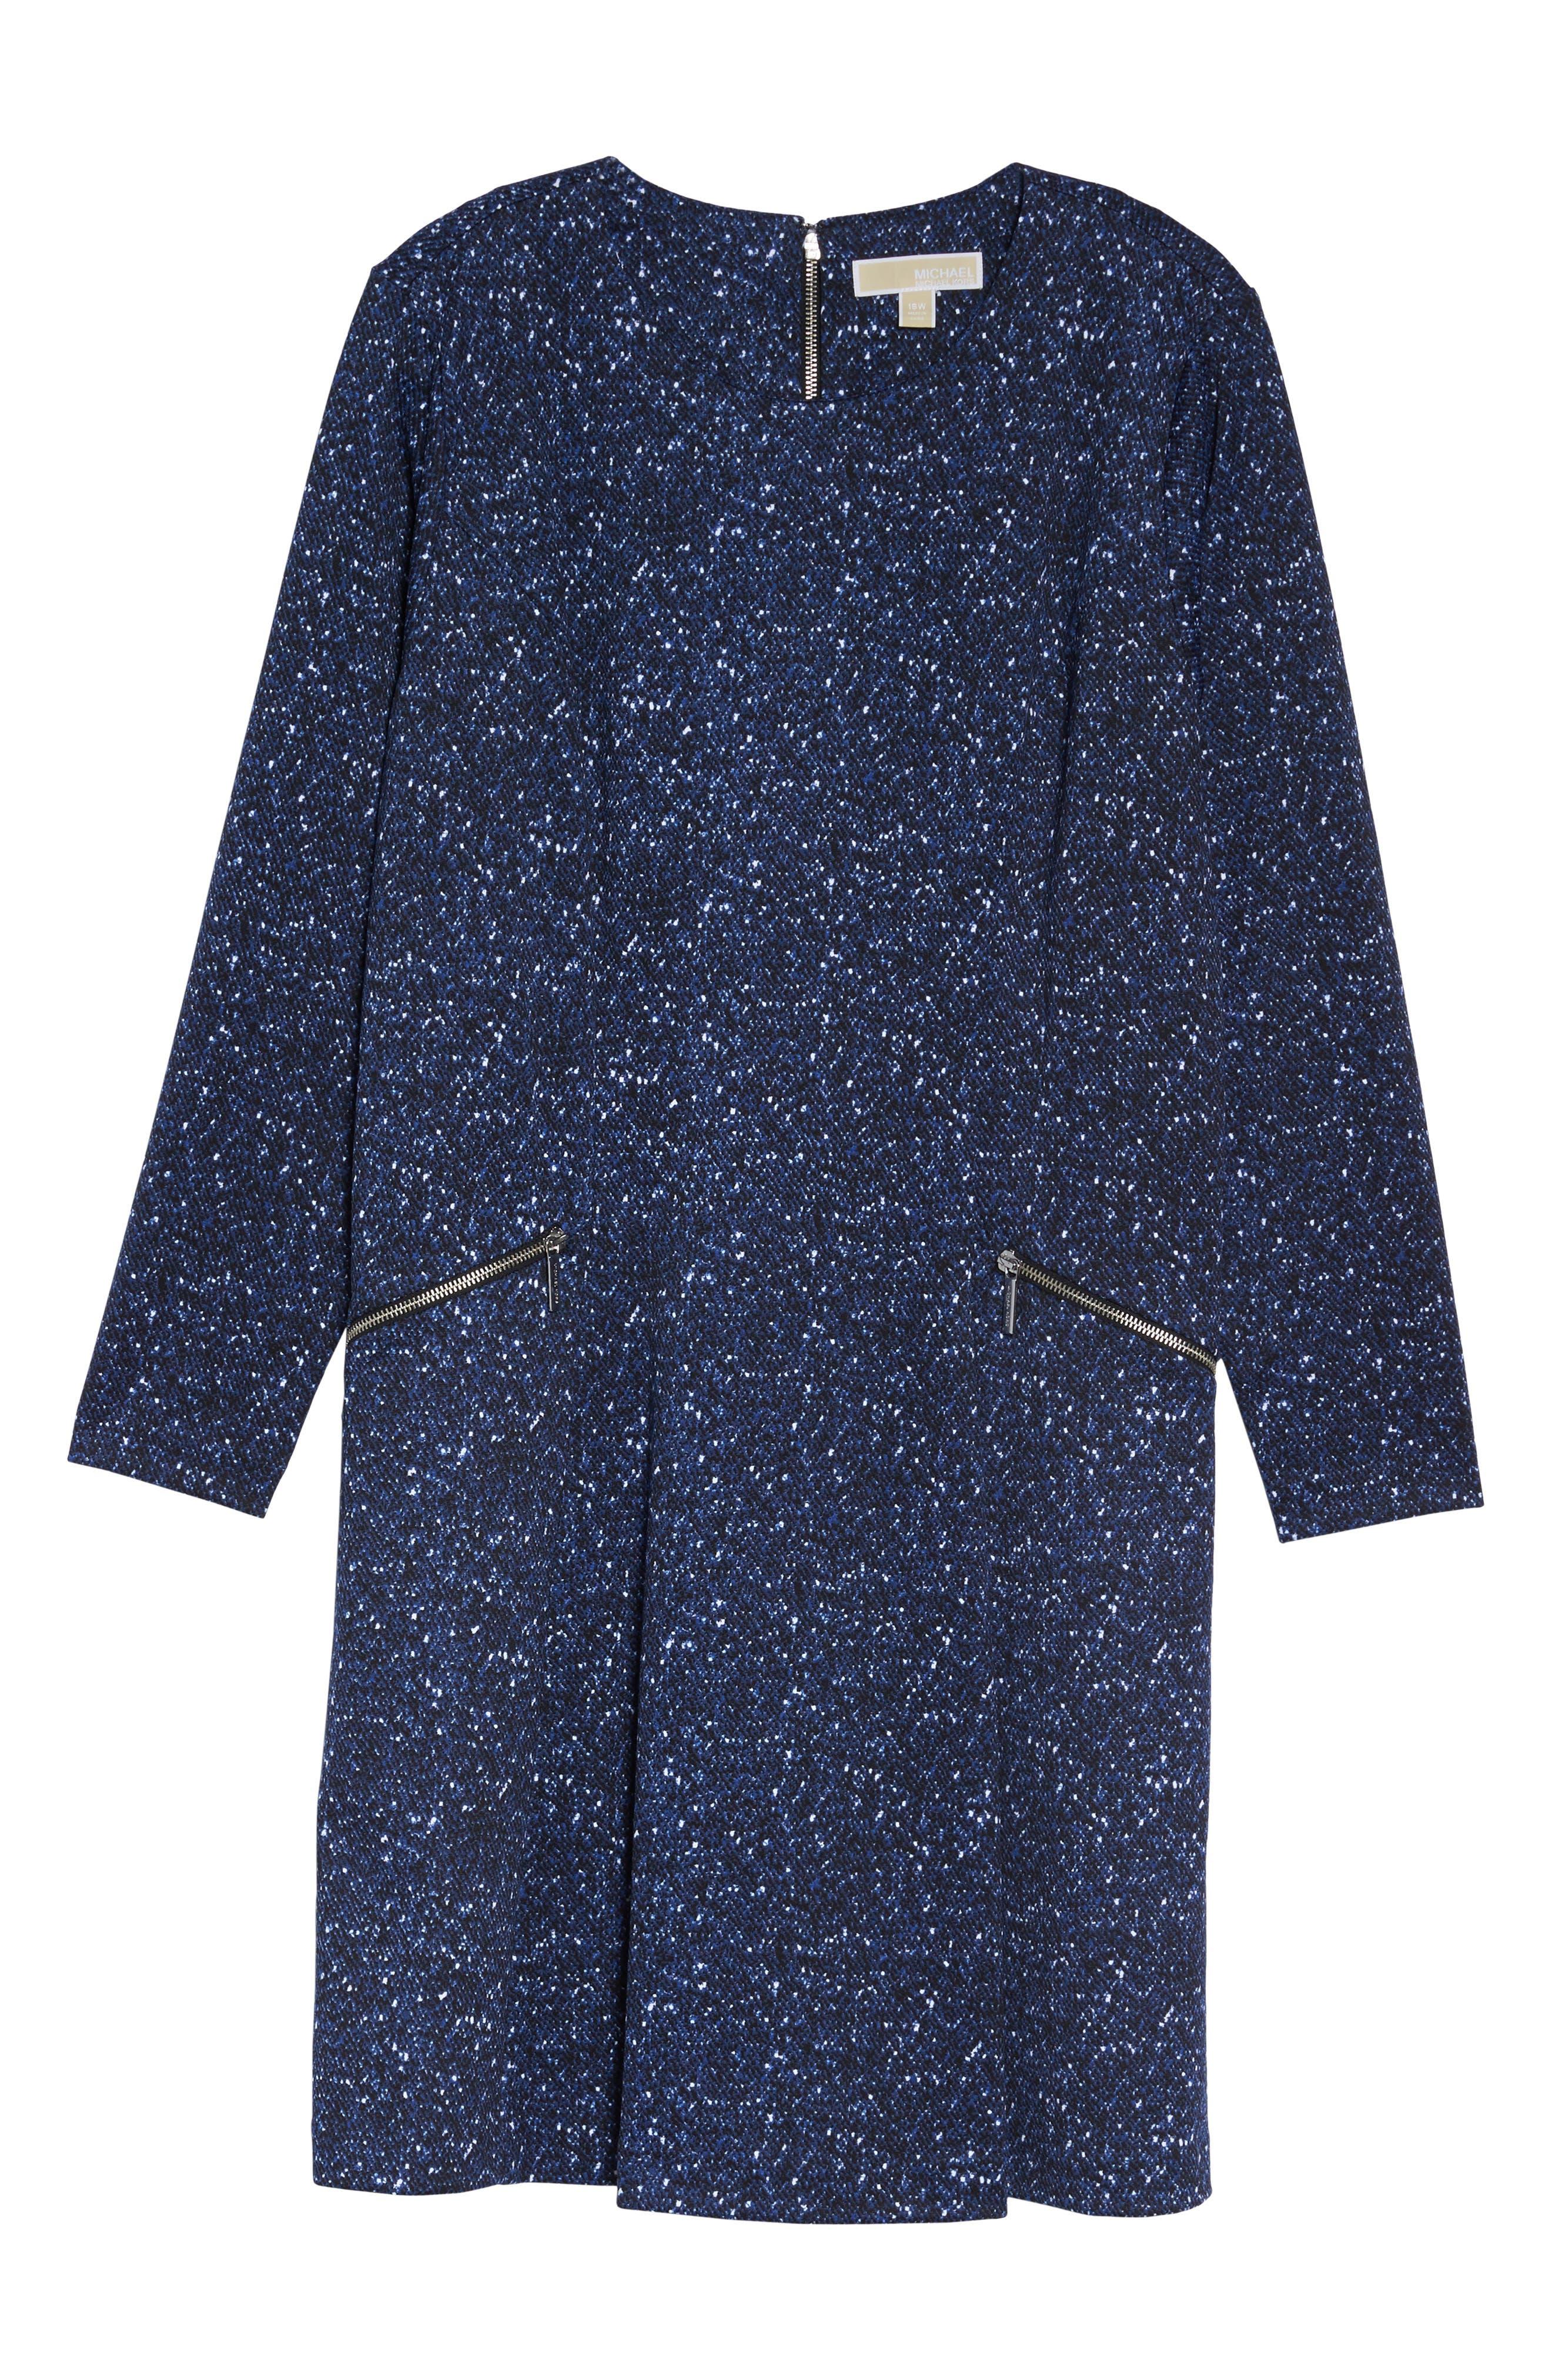 Tweed Print A-Line Dress,                             Alternate thumbnail 6, color,                             403